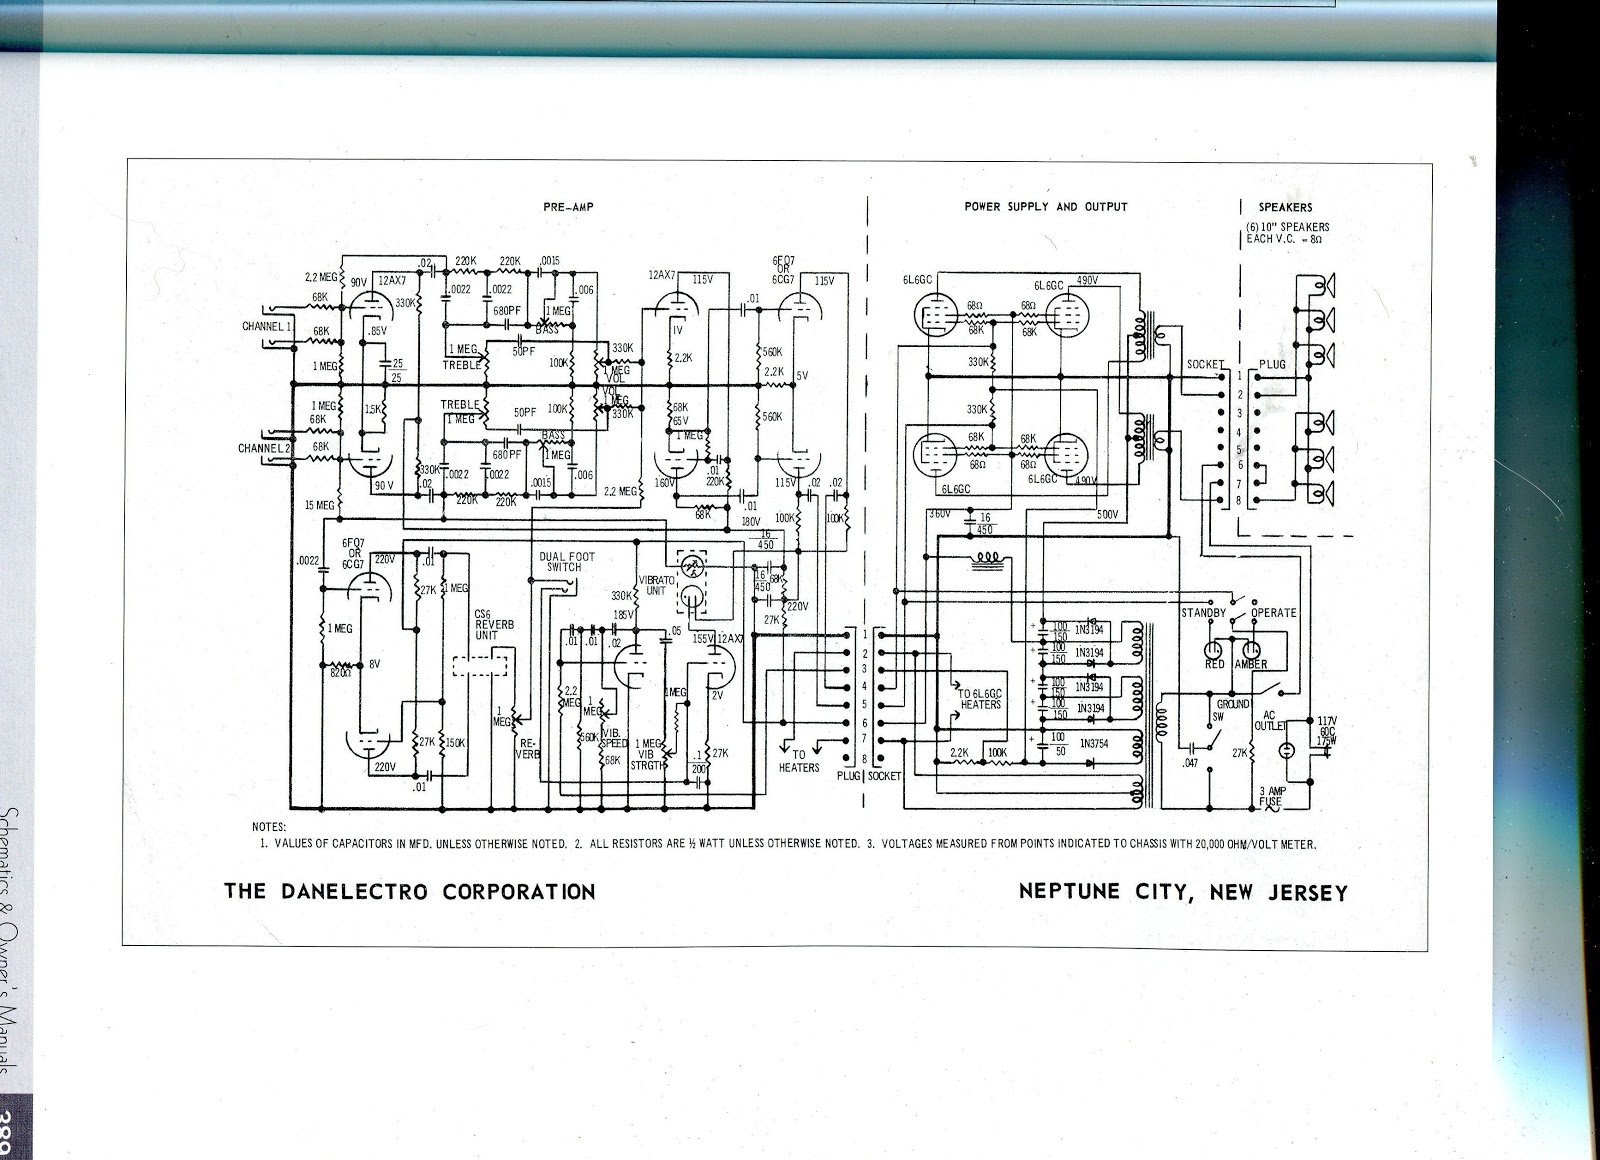 Judybox Revival Danelectro DS100 Schematic